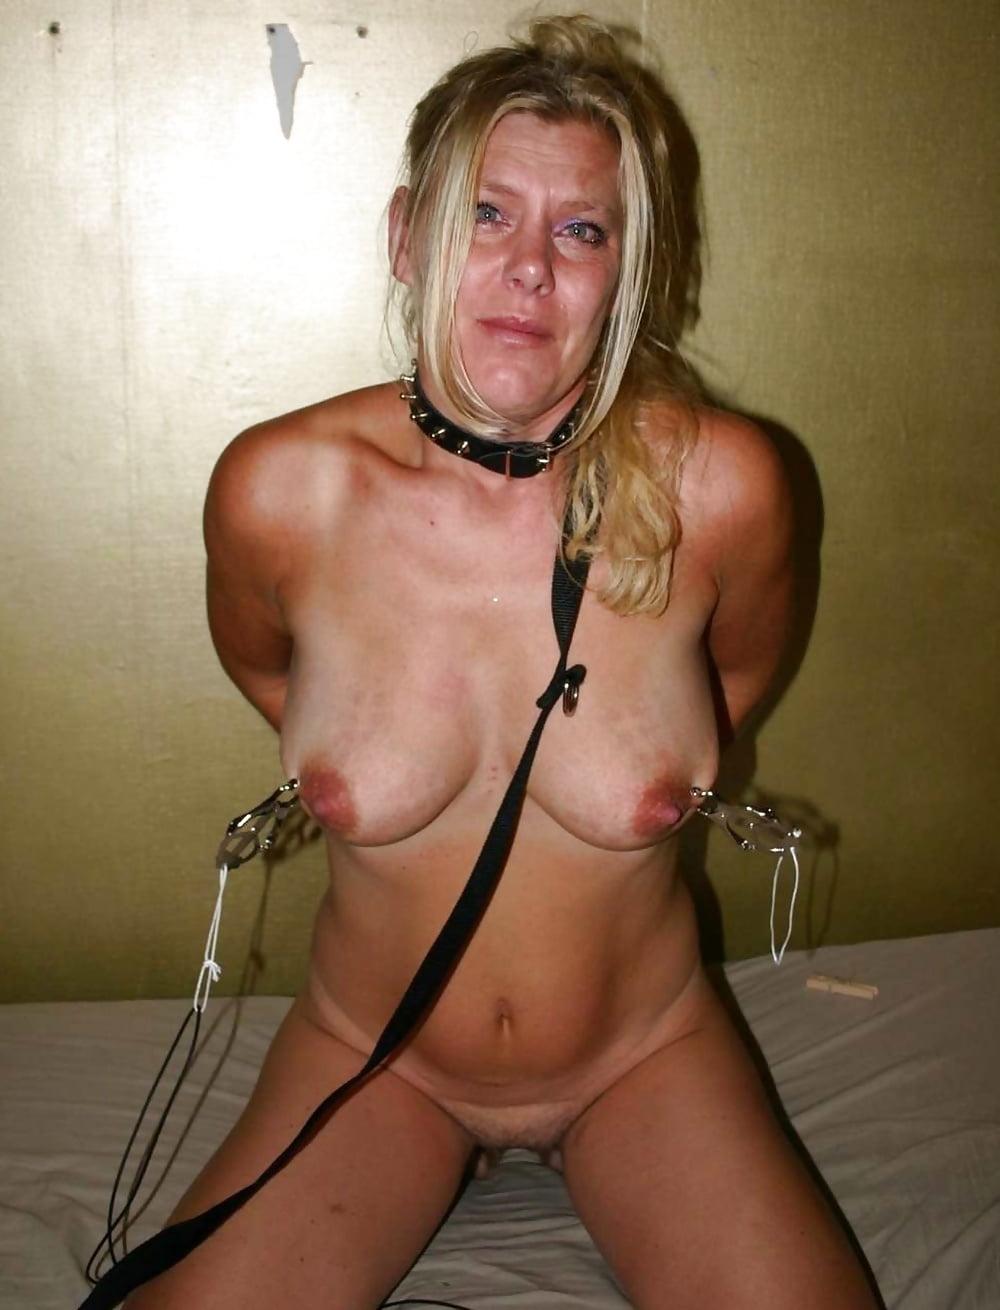 Sex Slaves Crying - 37 Pics  Xhamster-9133